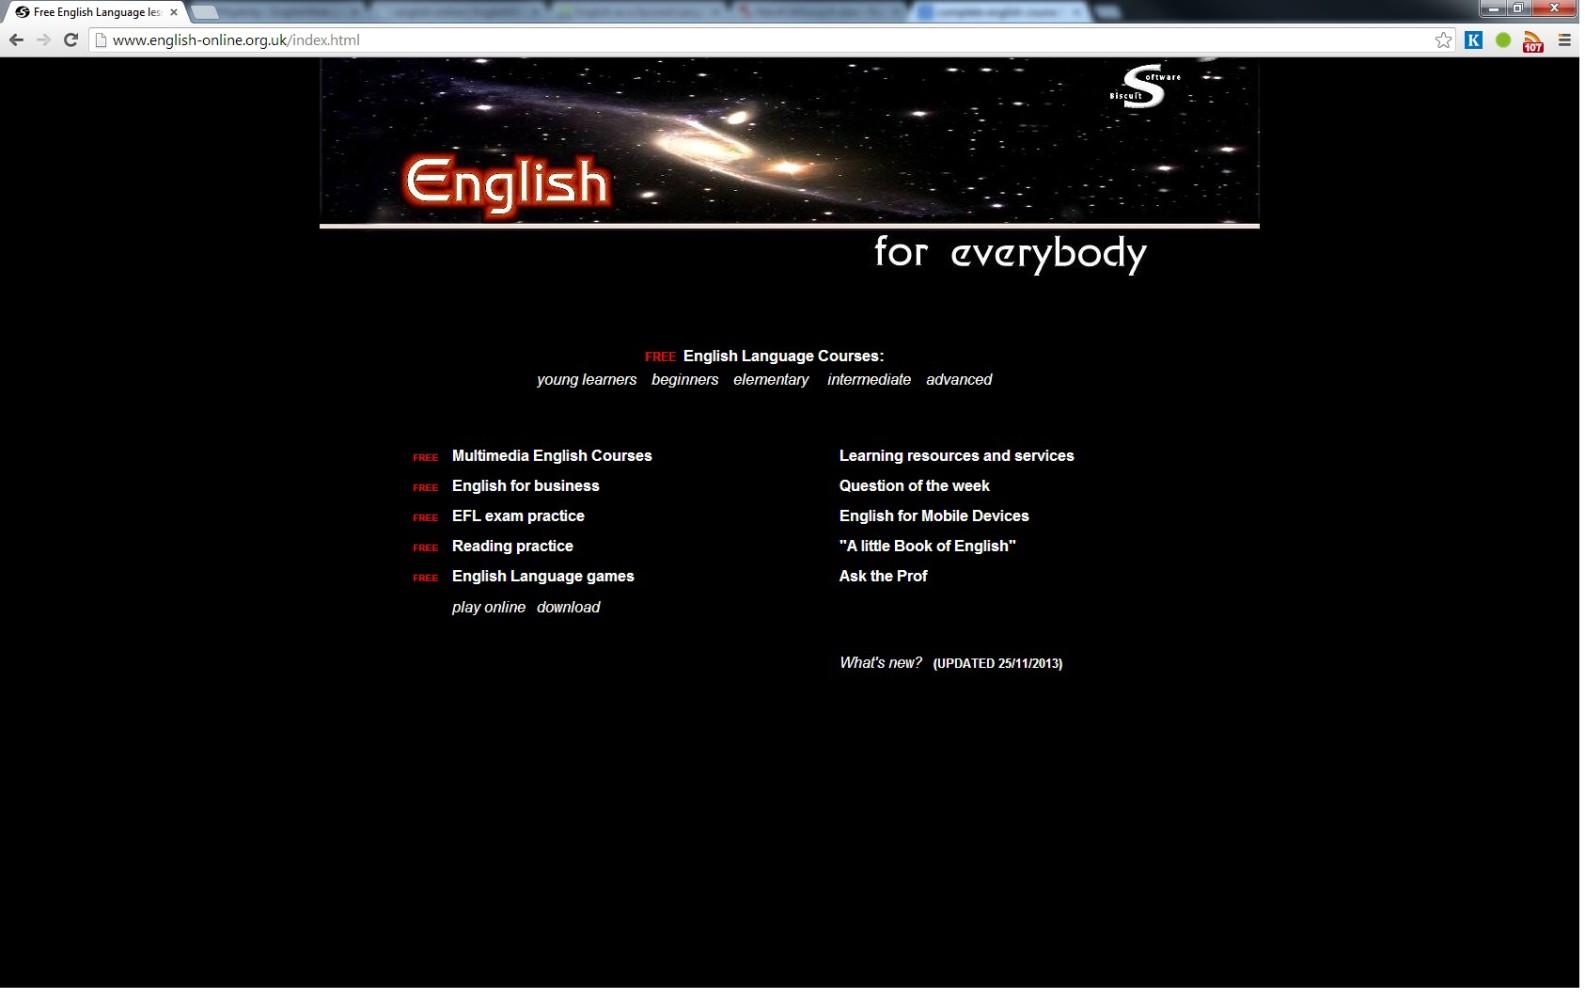 kurzy angličtiny - online a zdarma